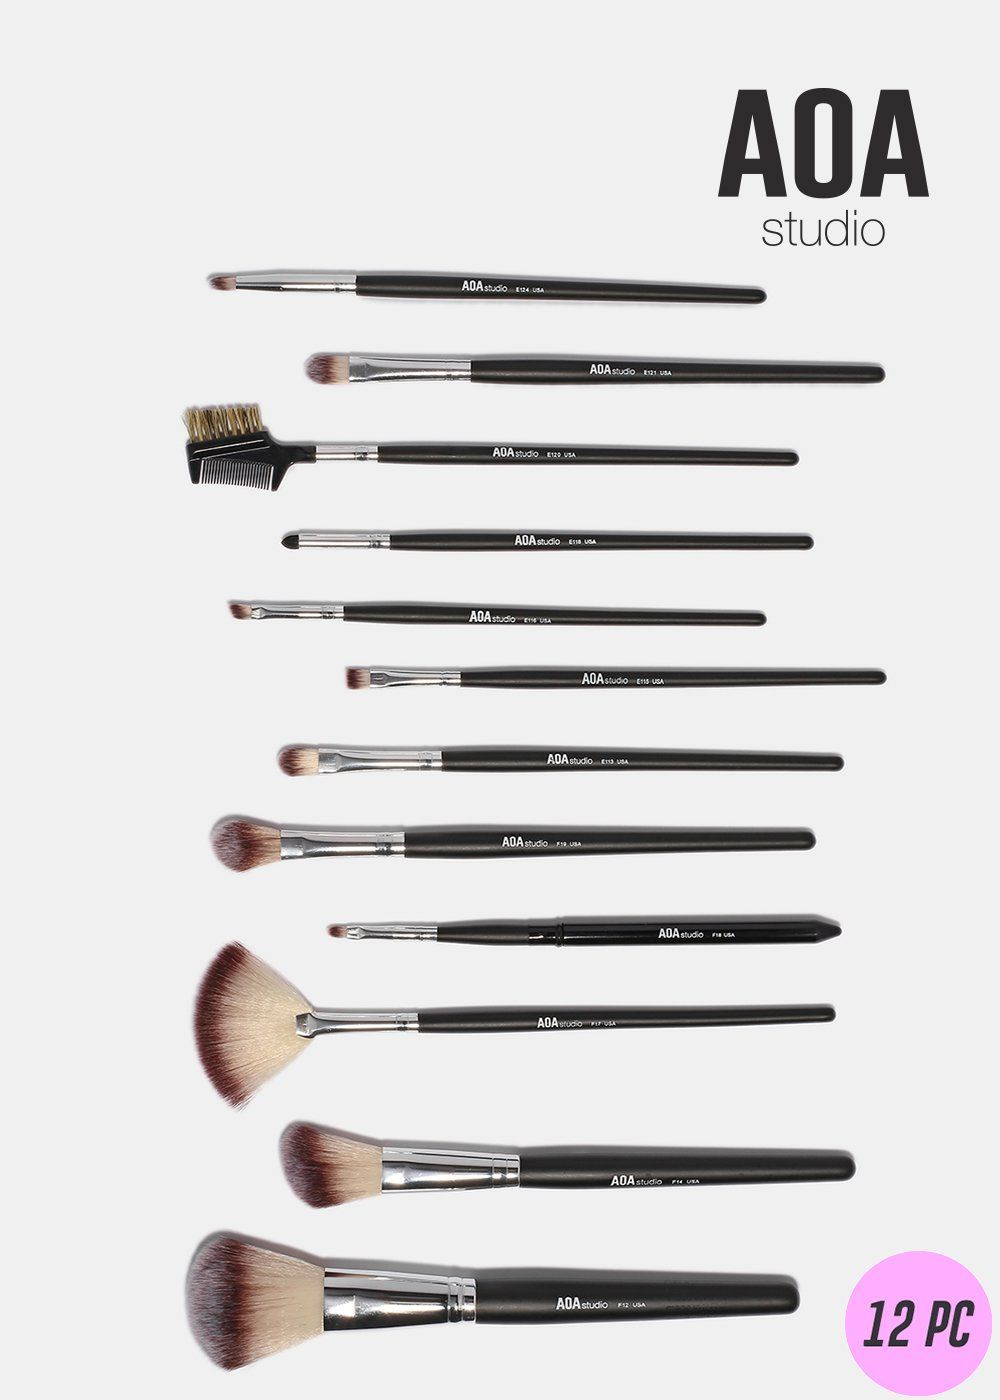 12-Piece PM Brush Set by AOA Studio #6